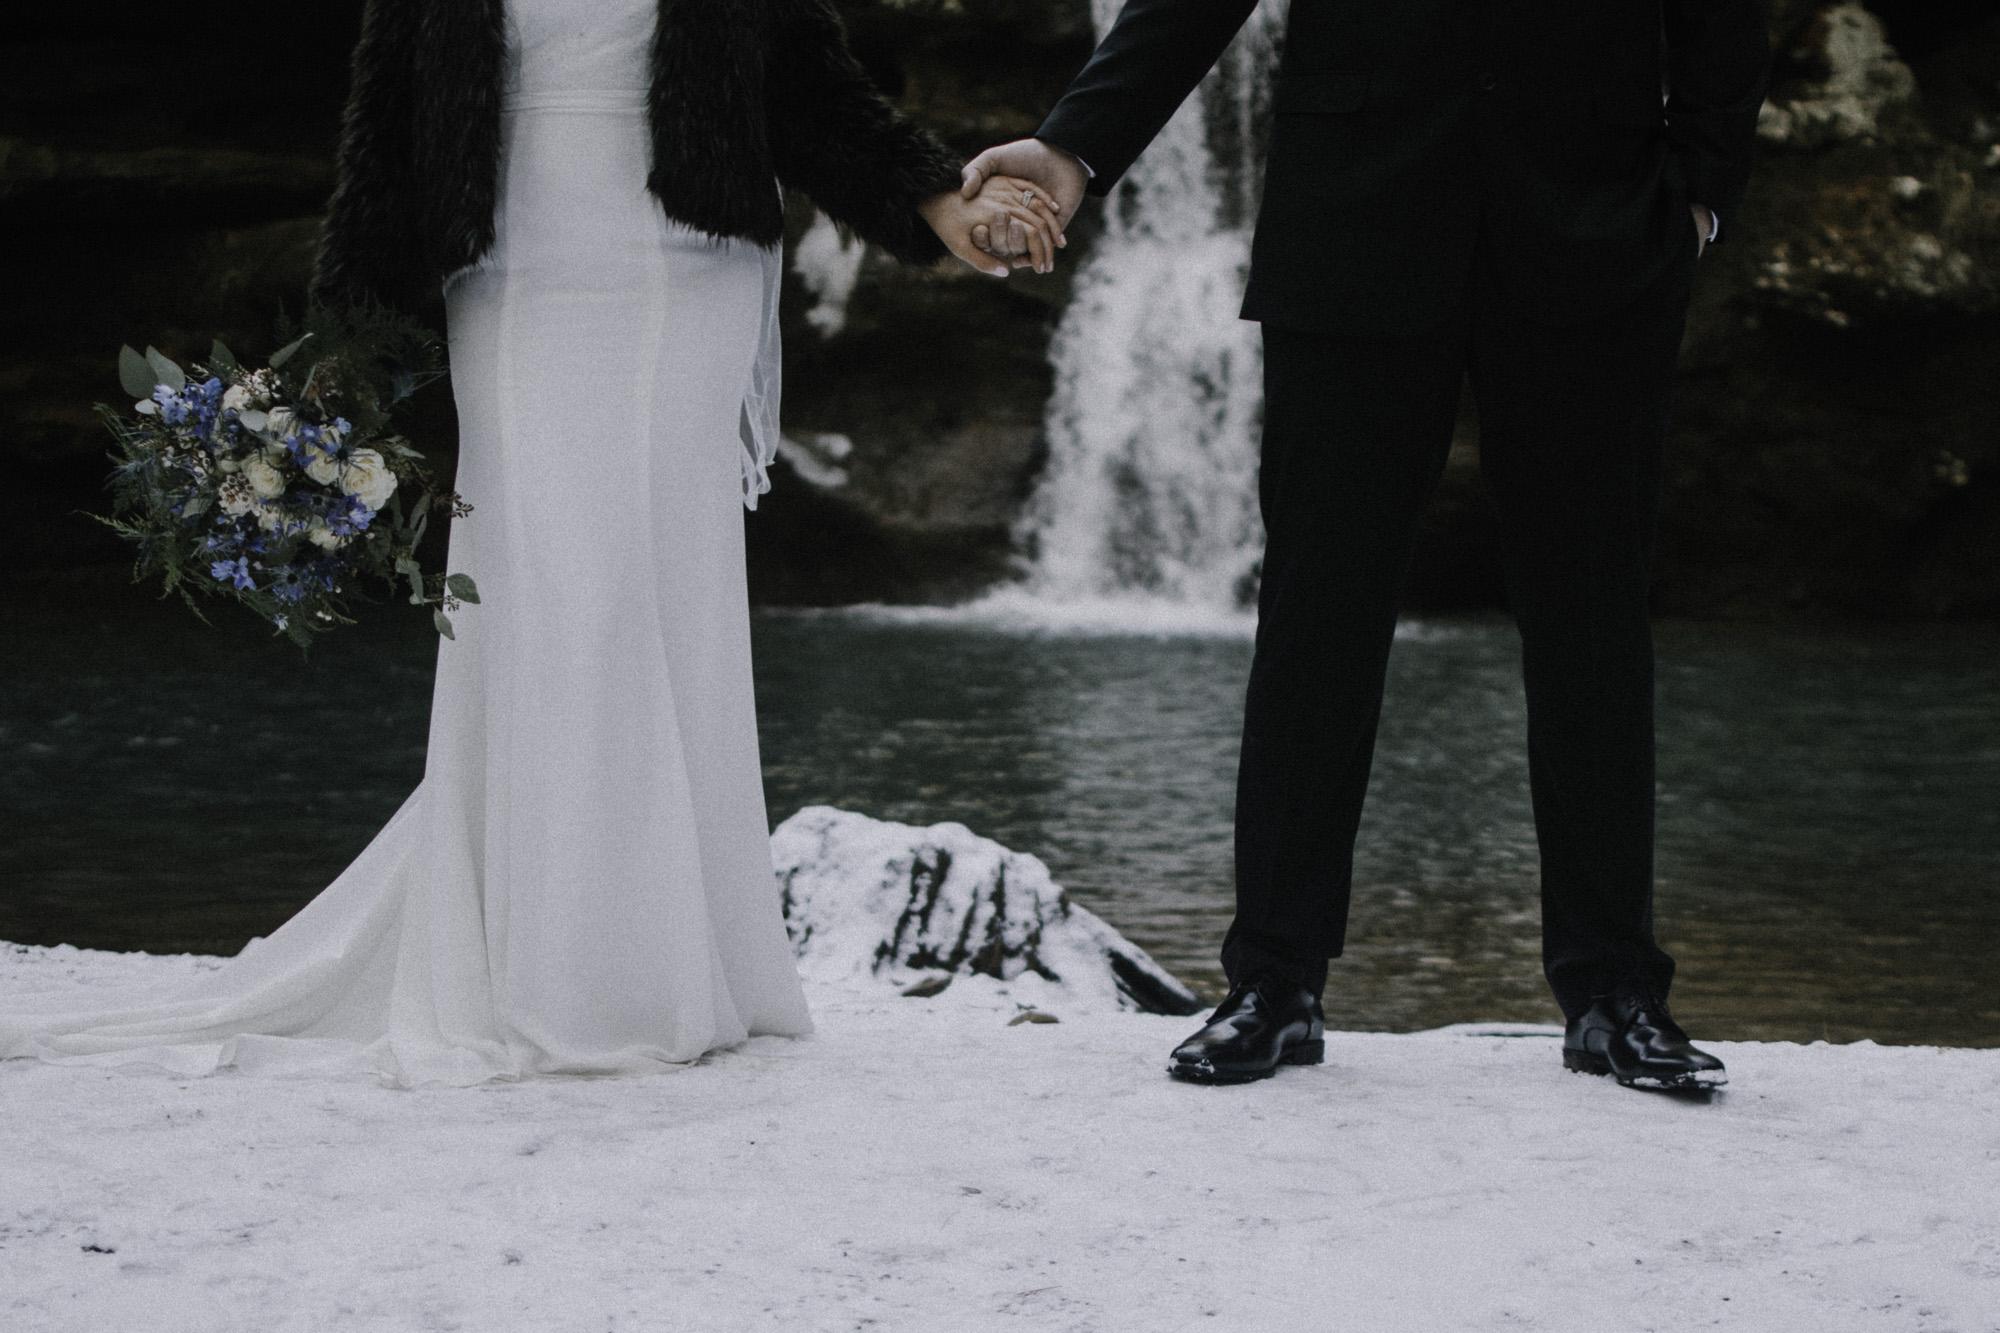 Cate_Ann_Photography_Dayton_Ohio_Wedding_Elopement_And_Engagement_PhotographerDSC_6137.jpg